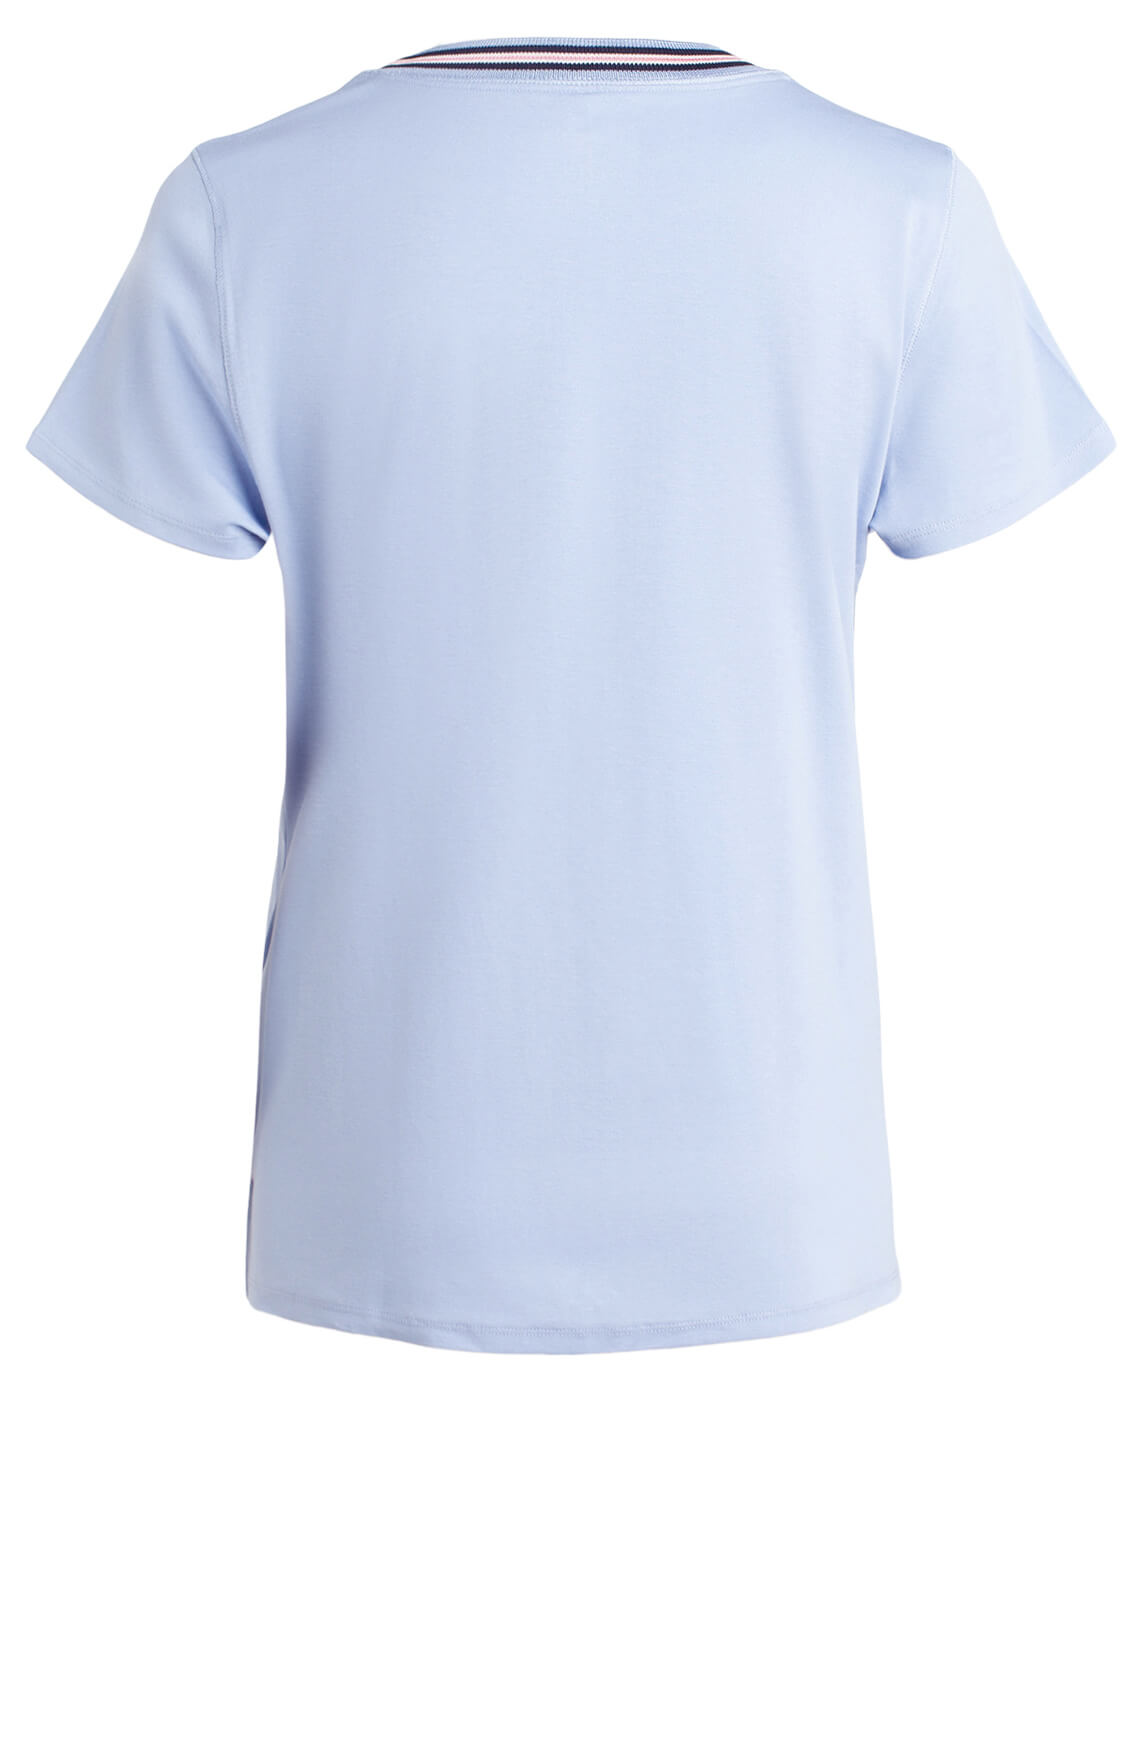 Marccain Dames Shirt met gestreepte hals Paars